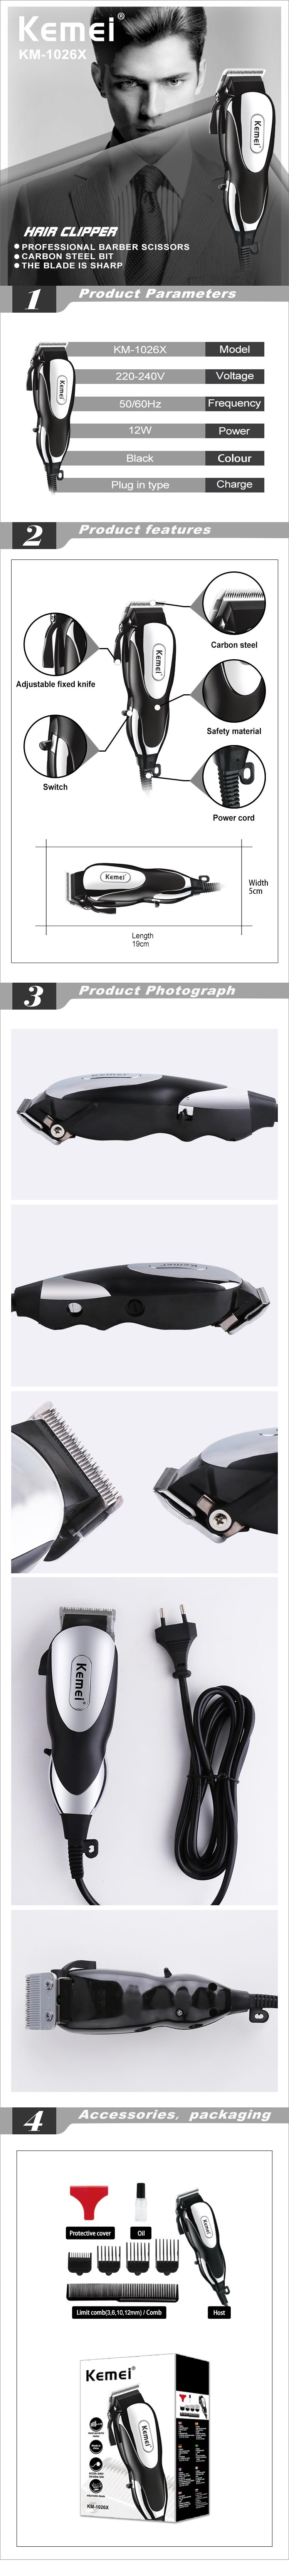 Kemei KM-1026X-cortadora de pelo eléctrica profesional, recargable, cabezal de acero al carbono lavable